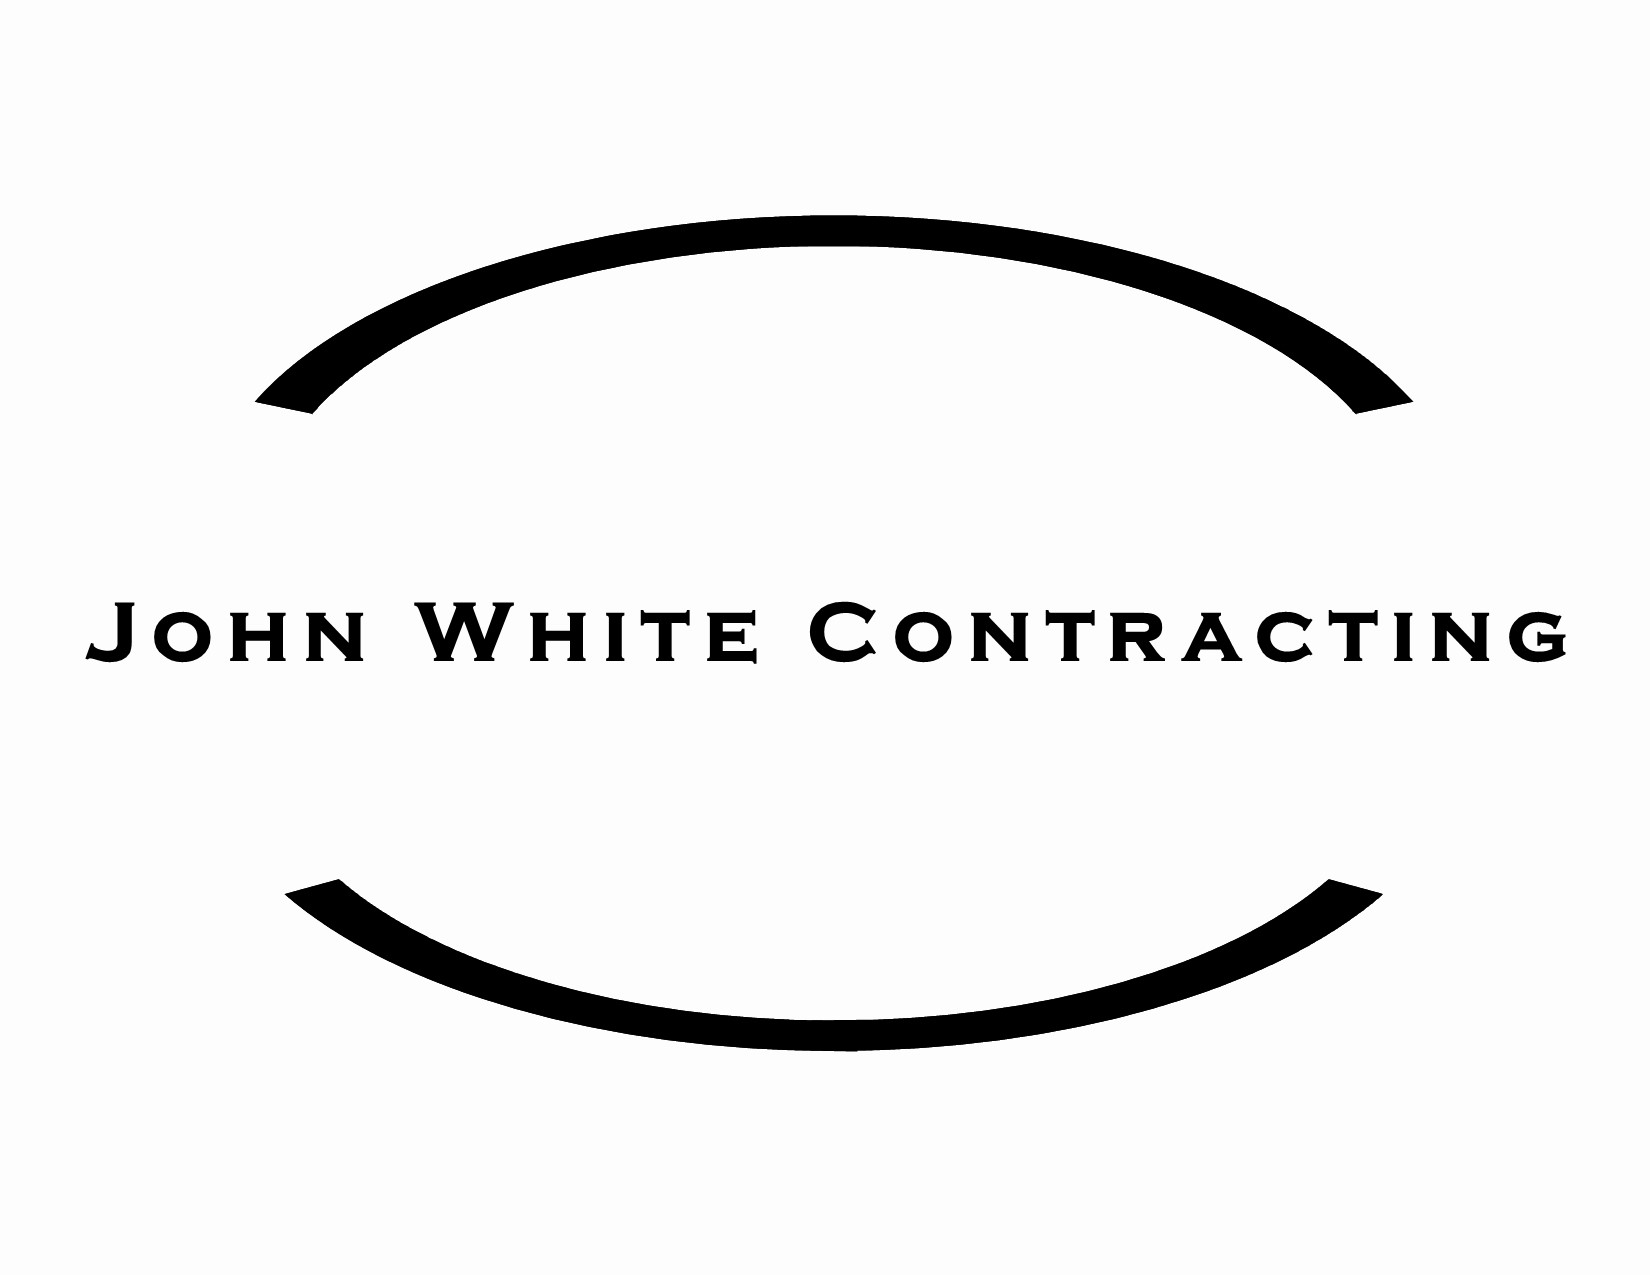 John White Contracting